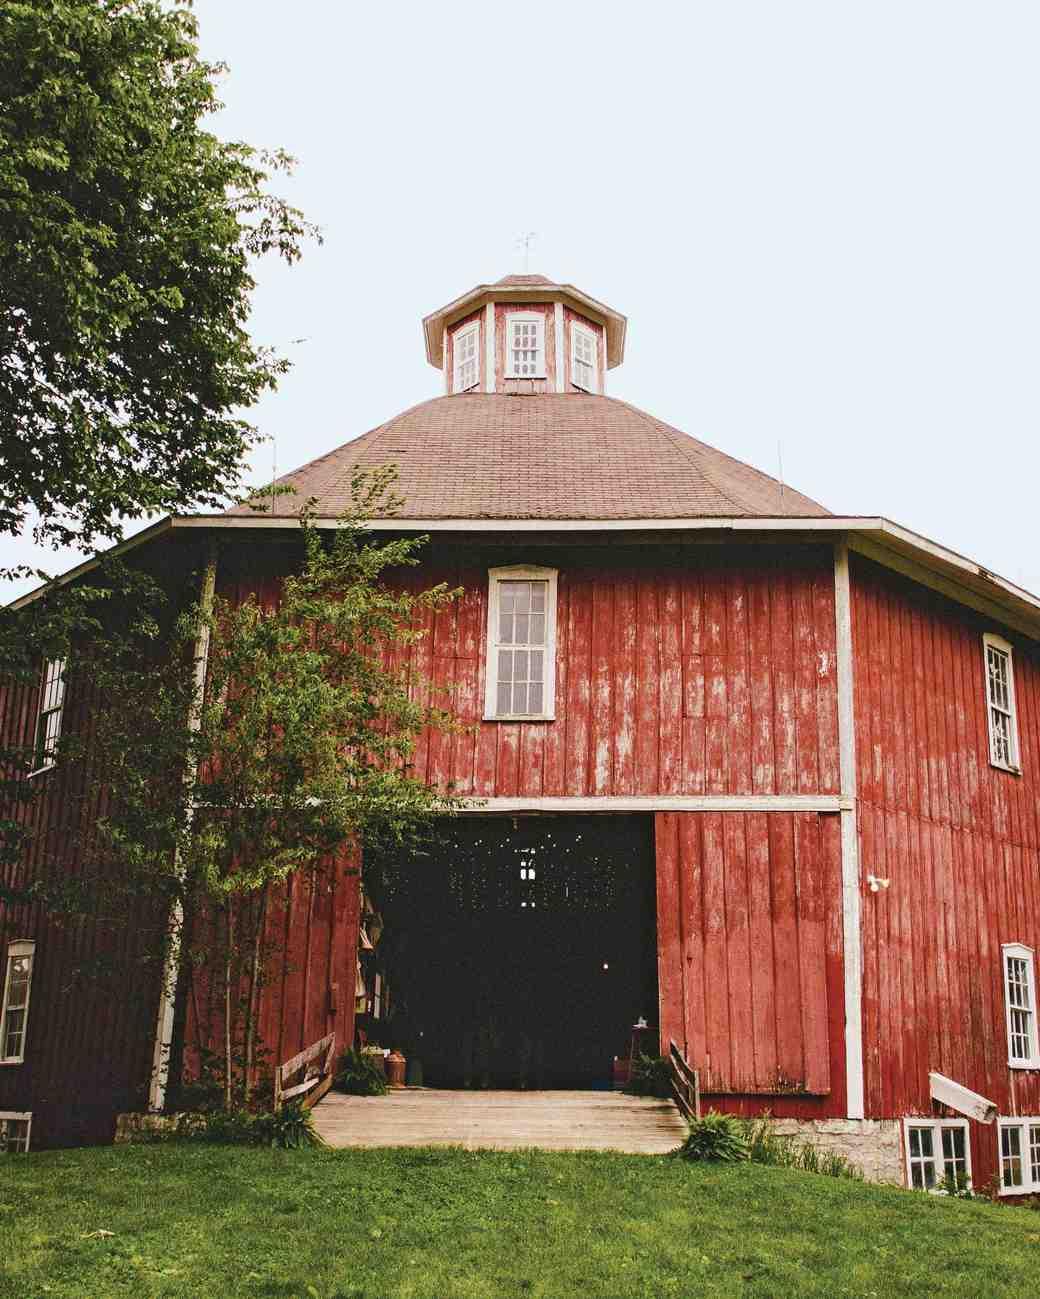 An Outdoor Barn Wedding in Iowa | Martha Stewart Weddings